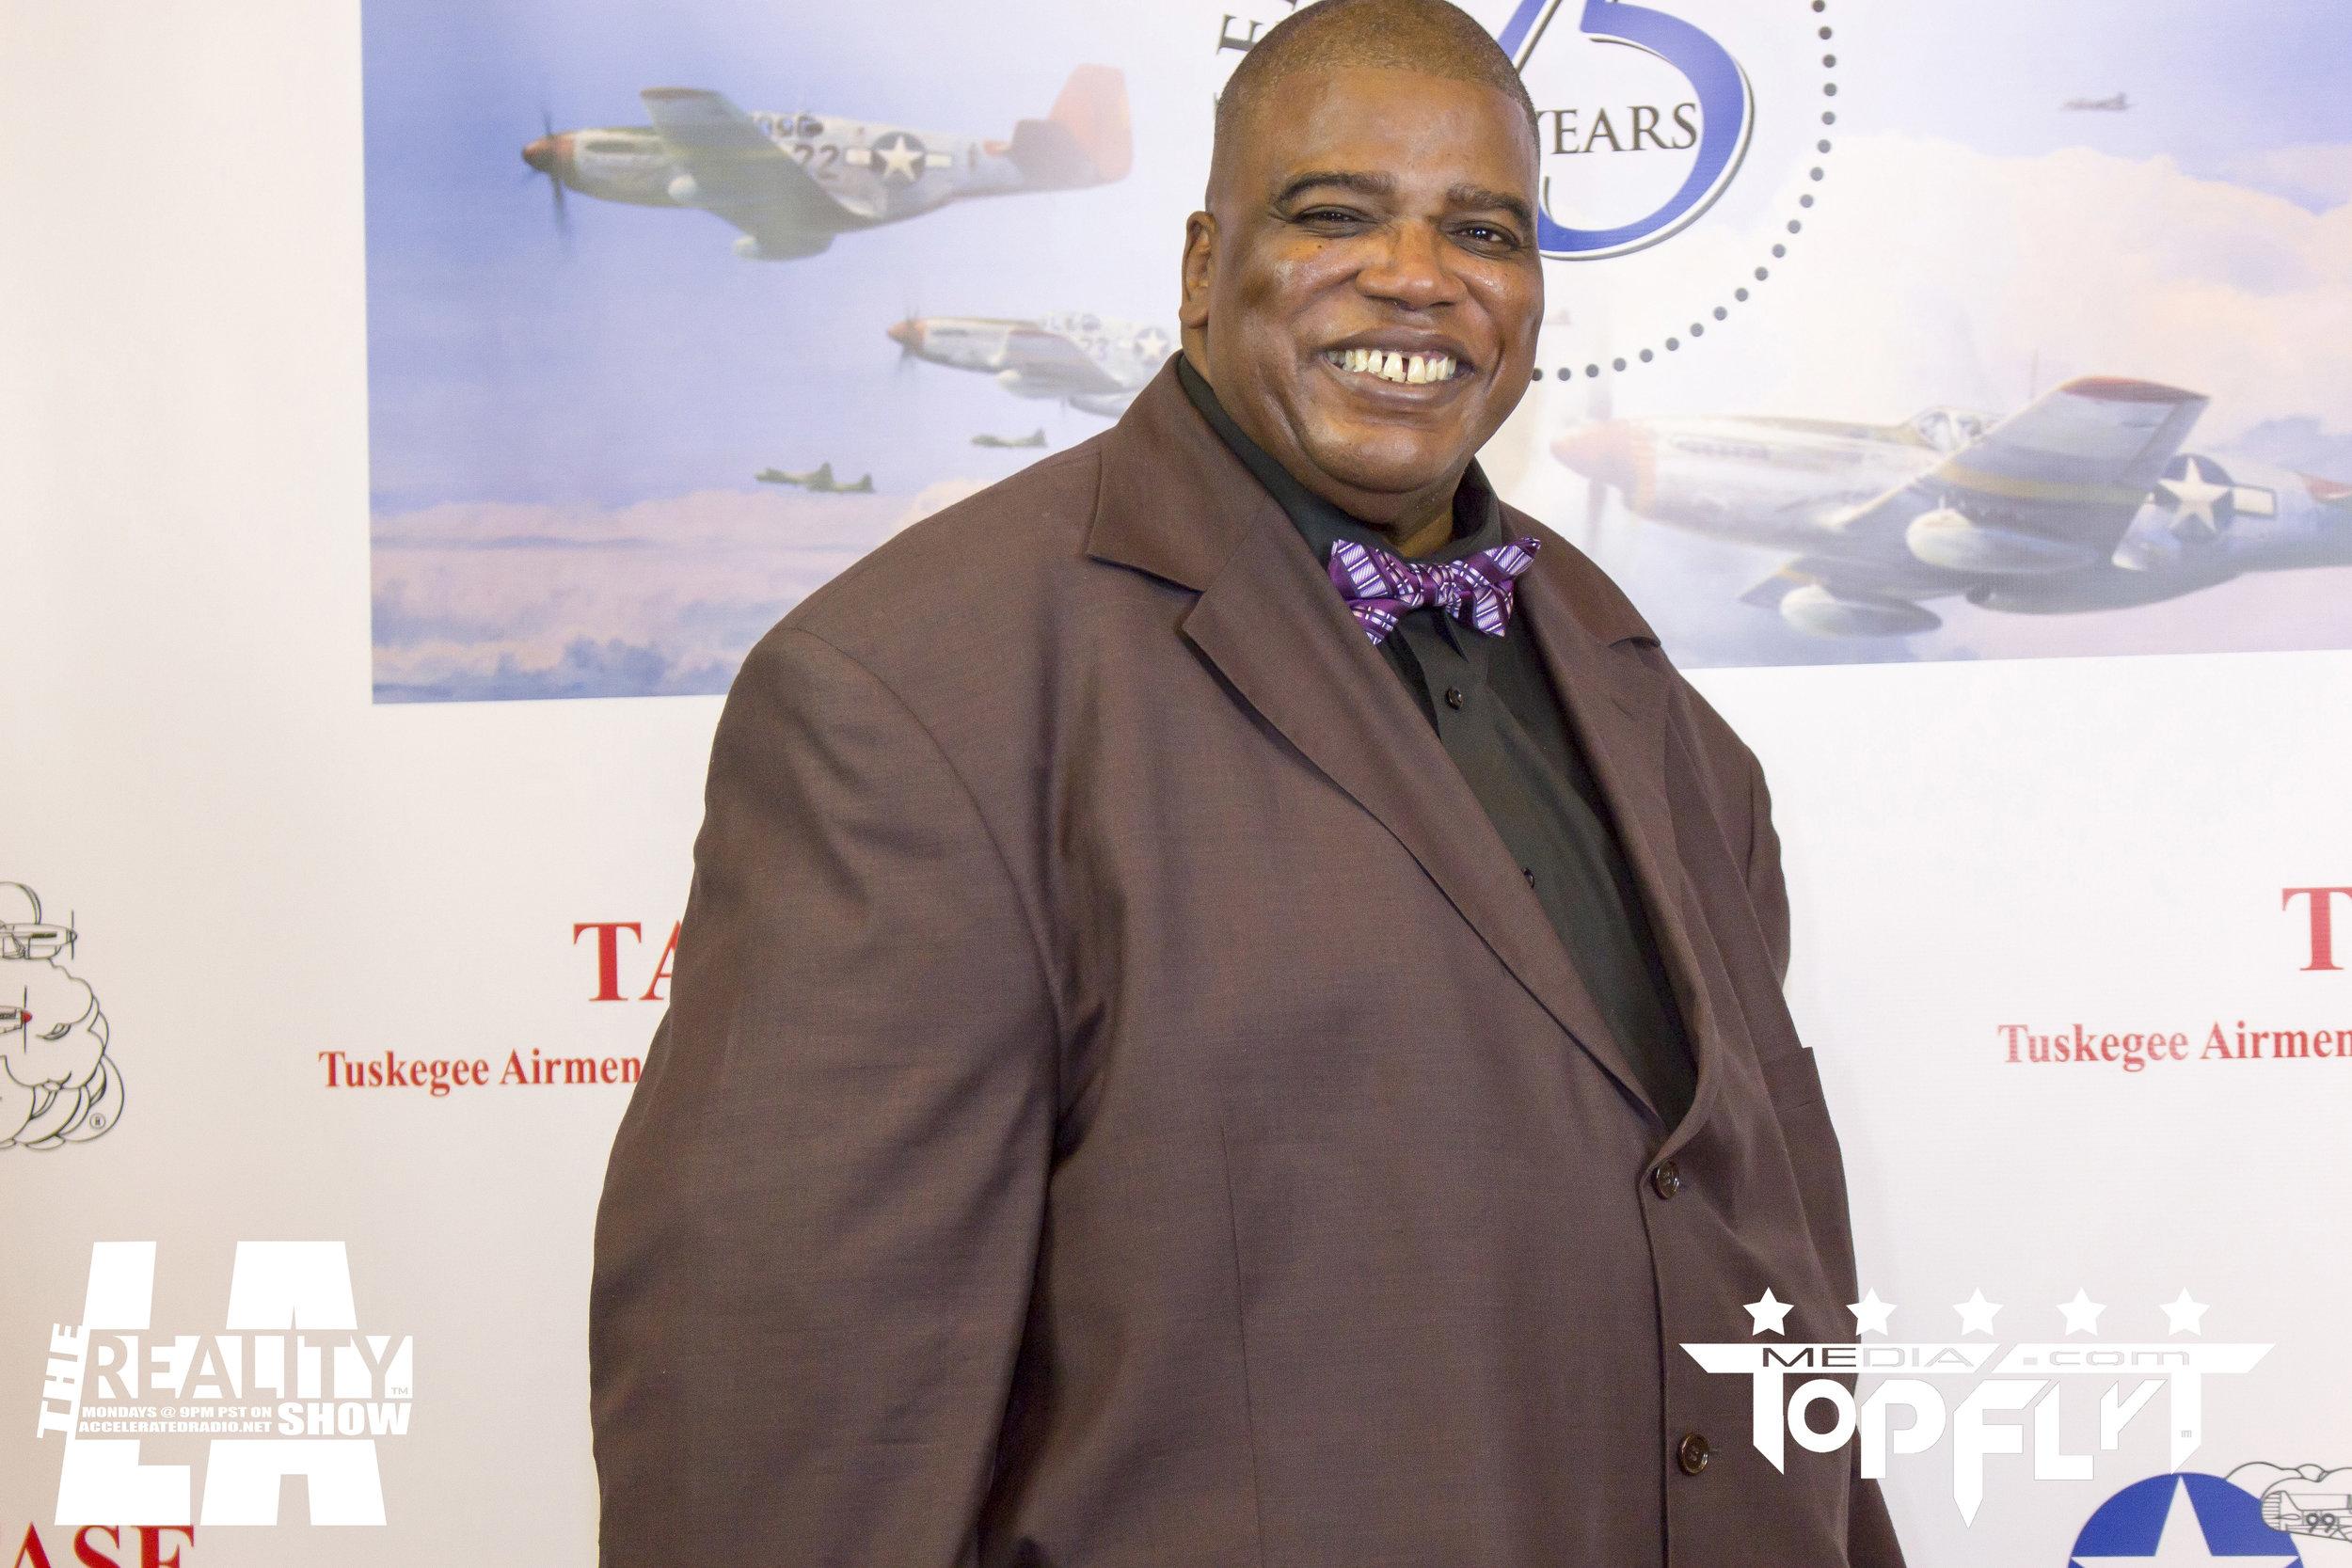 The Reality Show LA - Tuskegee Airmen 75th Anniversary VIP Reception_46.jpg